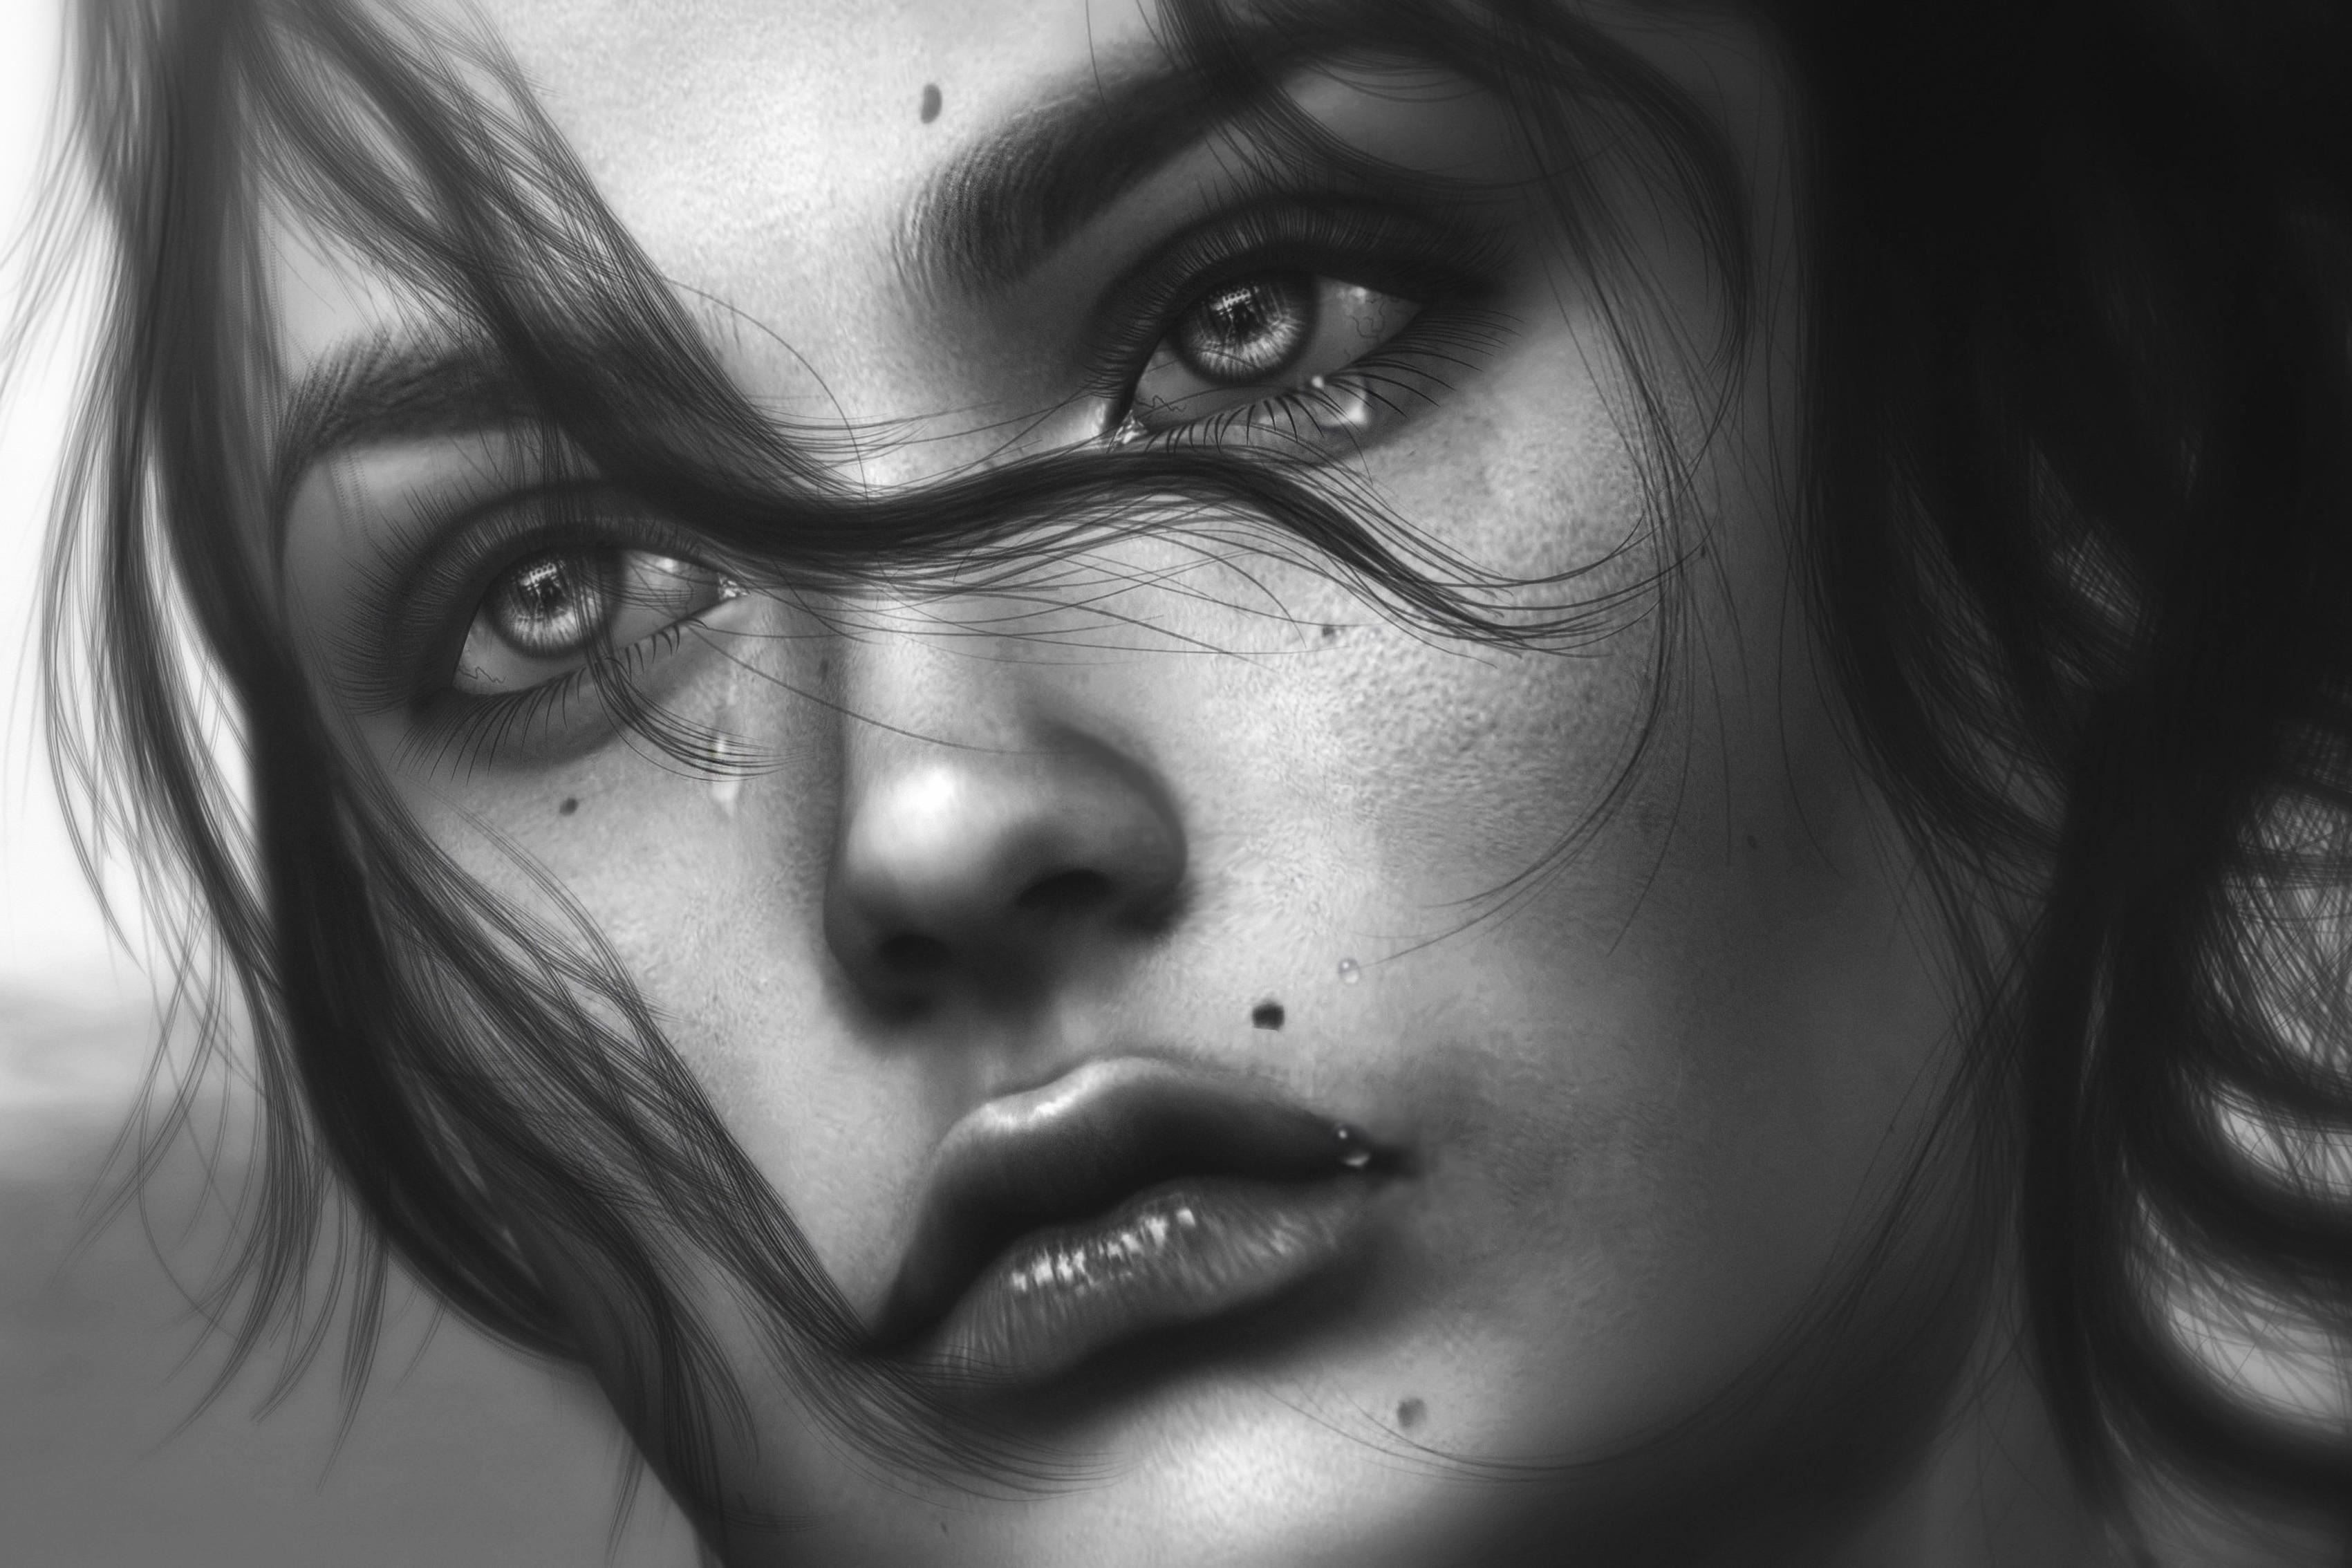 Hair Face Sadness Tears Girl Sadness Portrait Living Room -7498